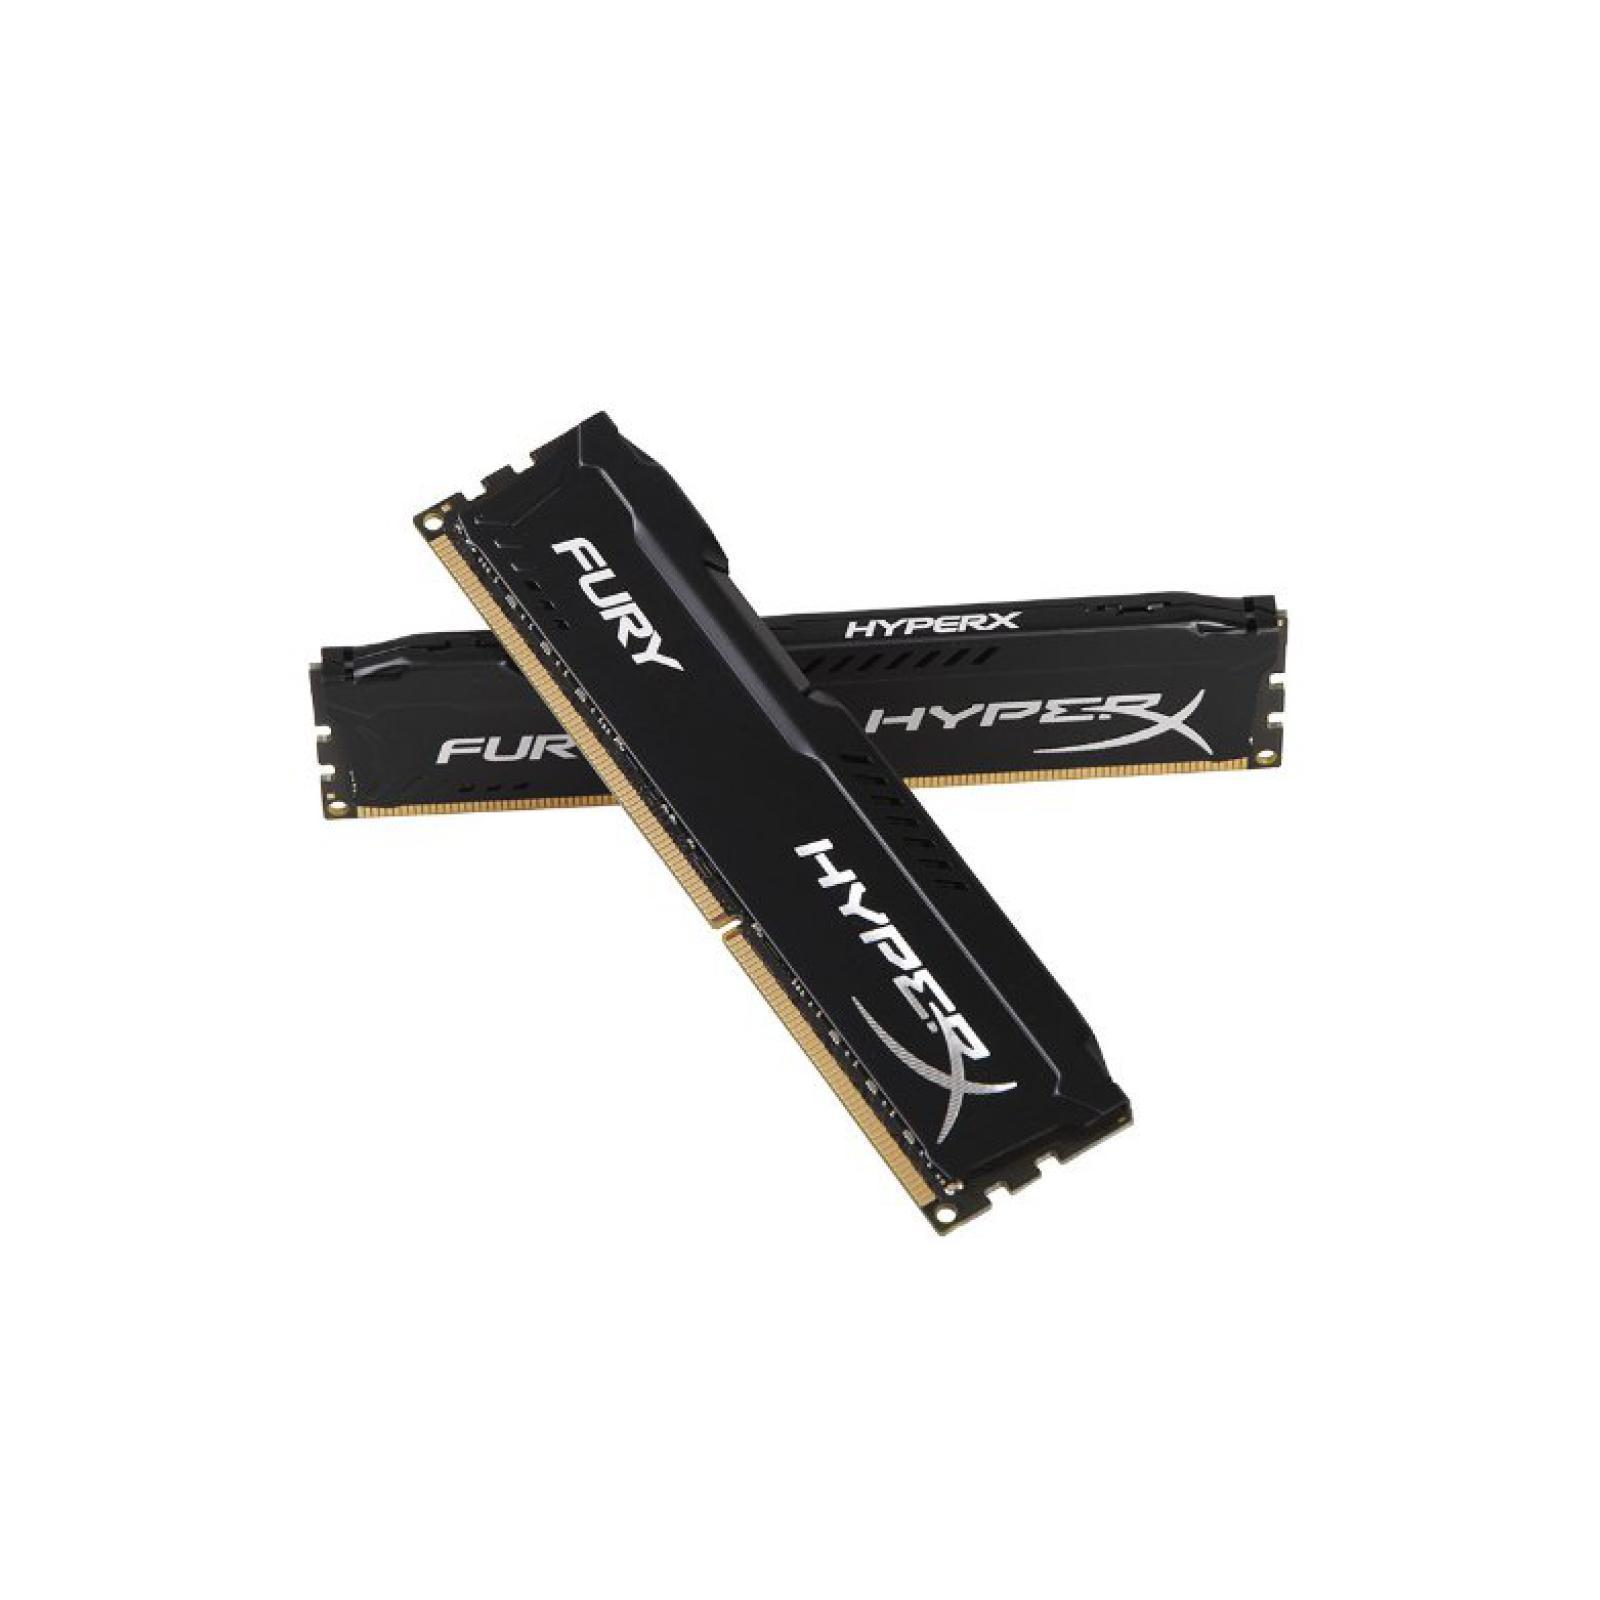 Модуль памяти для компьютера DDR4 32GB (2x16GB) 3466 MHz HyperX FURY Black HyperX (Kingston Fury) (HX434C19FBK2/32) изображение 3